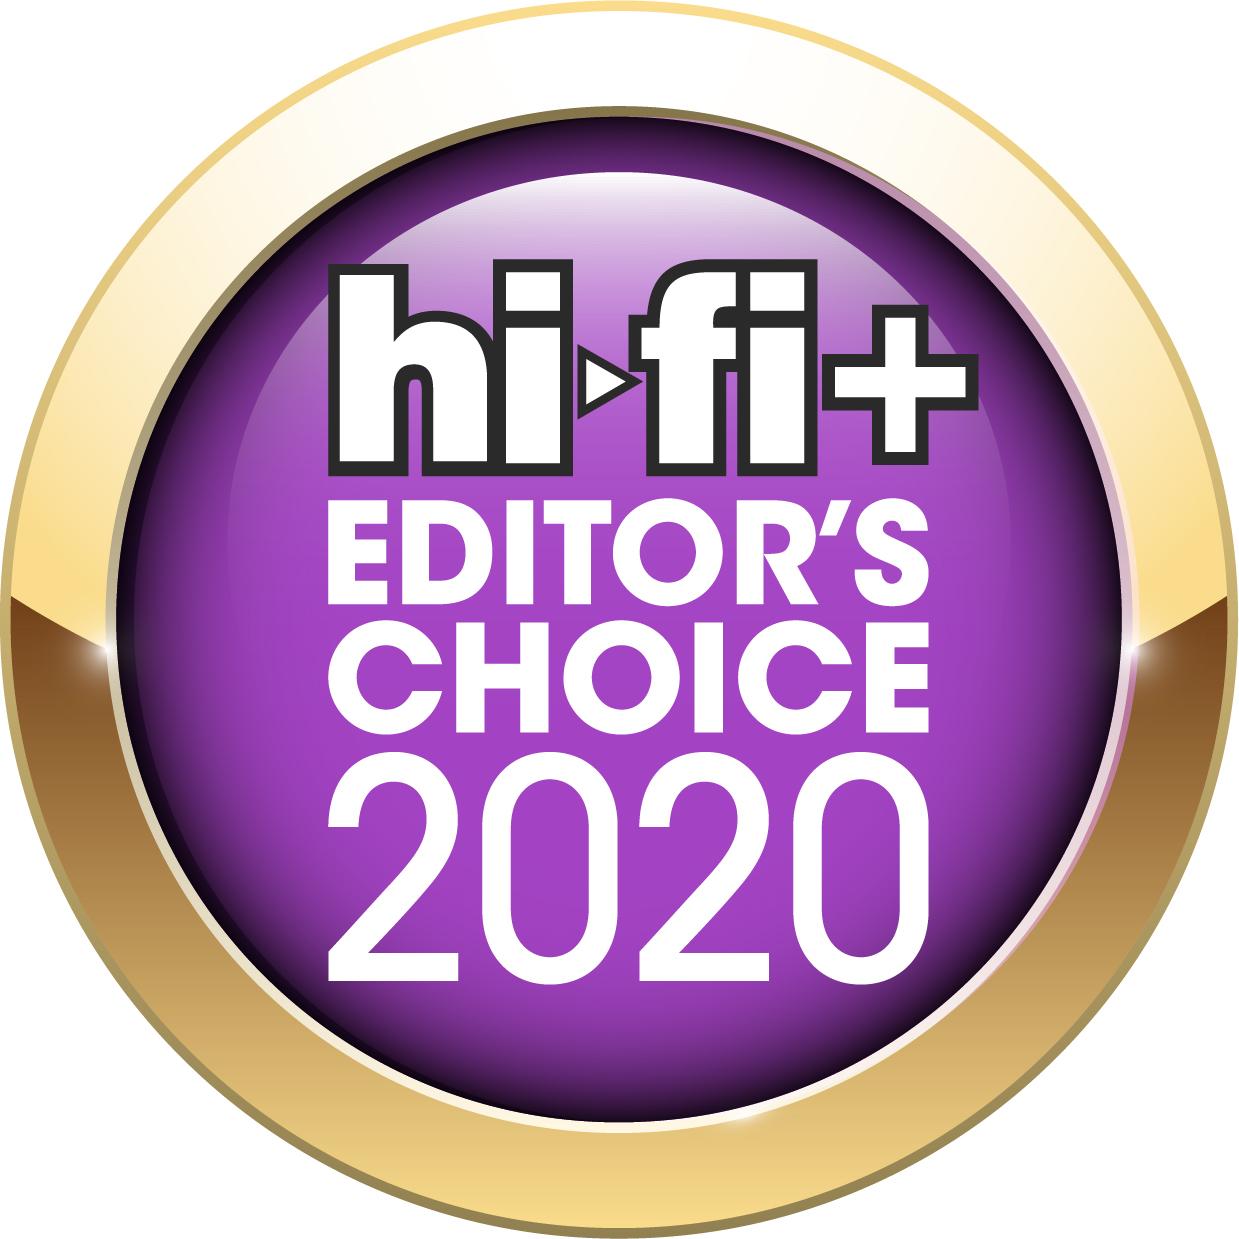 HiFi-_EditorsChoice_2020